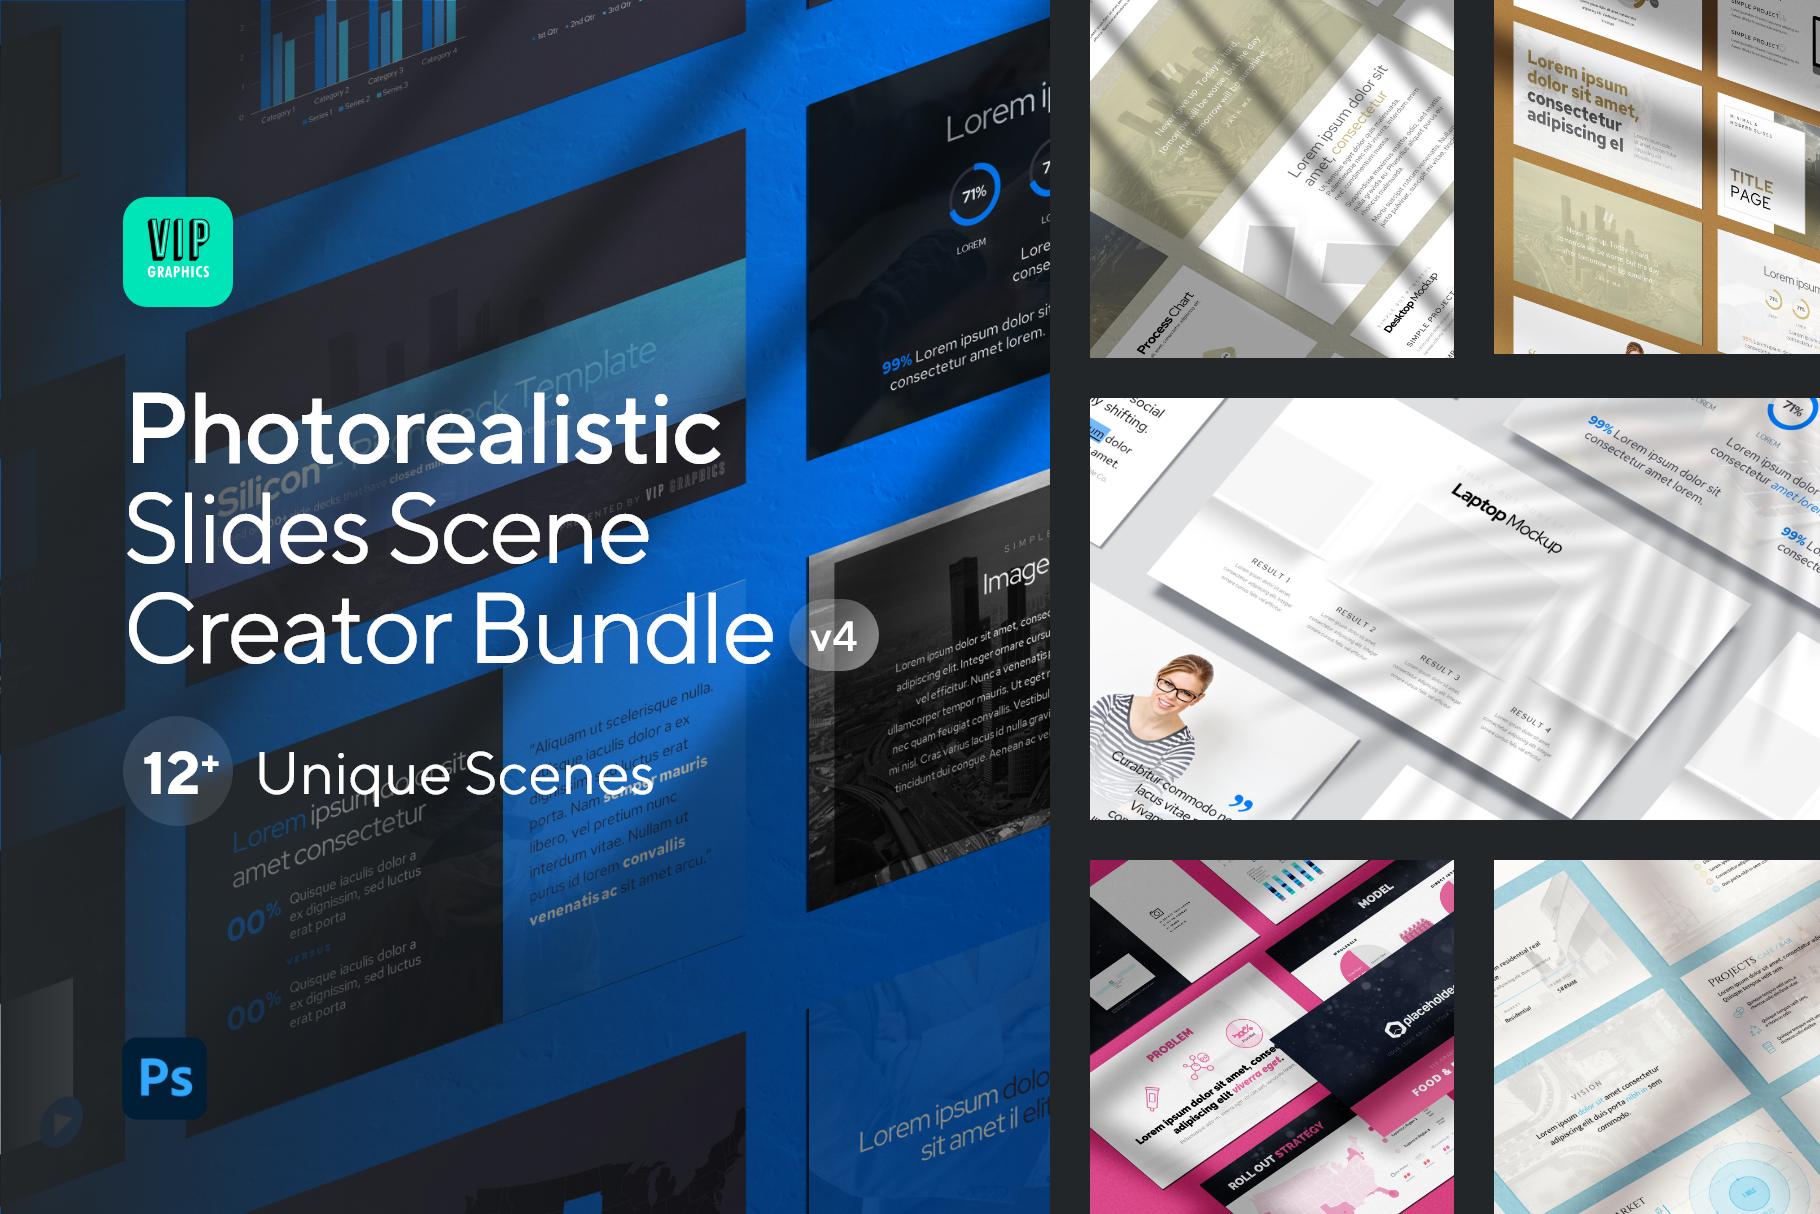 Photorealistic Slides Mockup PSD - Scene Creator Shadows & Textures | VIP.graphics